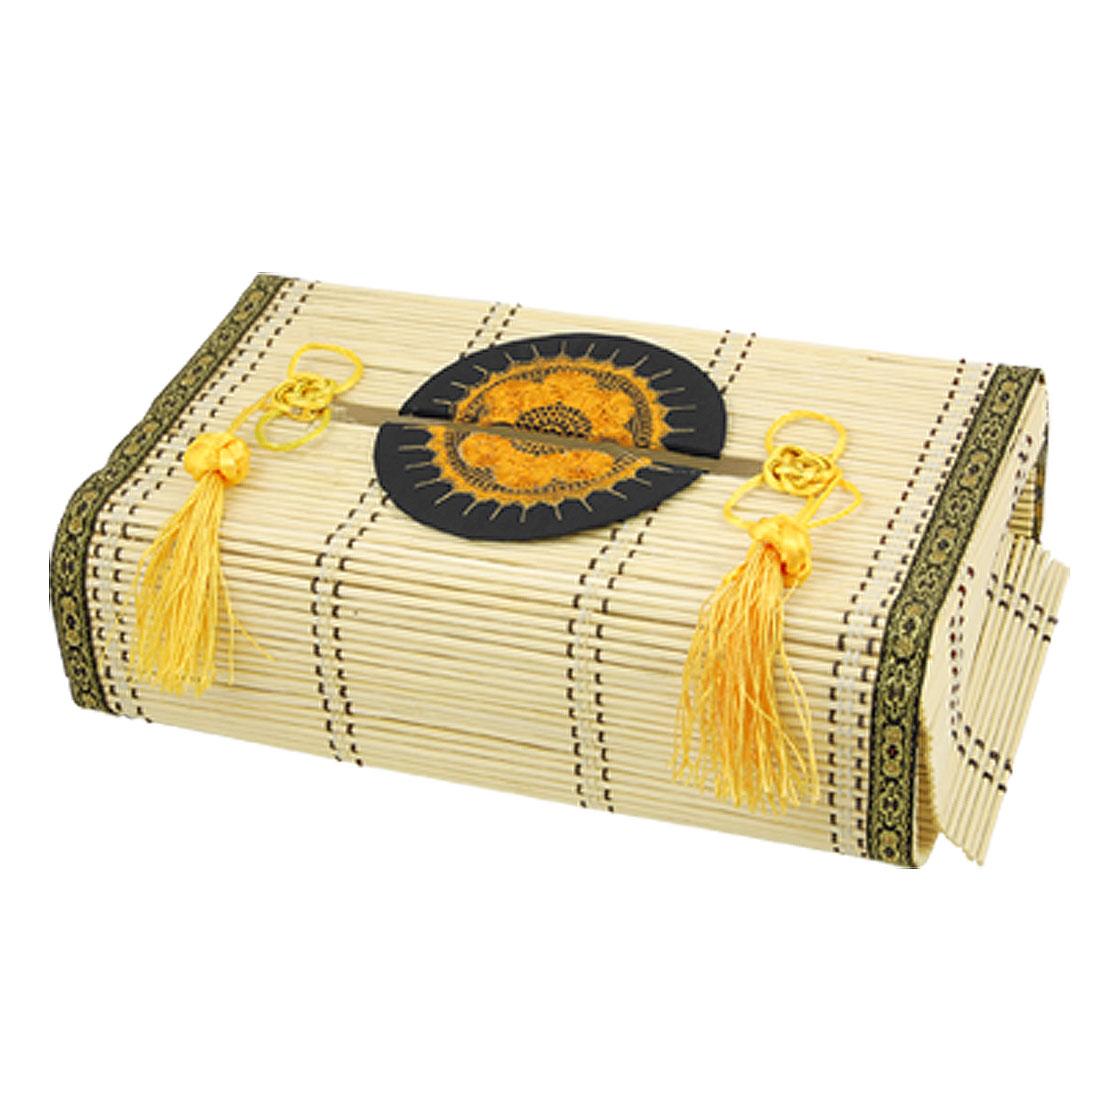 Bamboo Folk Handcraft Tissue Holder Paper Box W Yellow Tassel